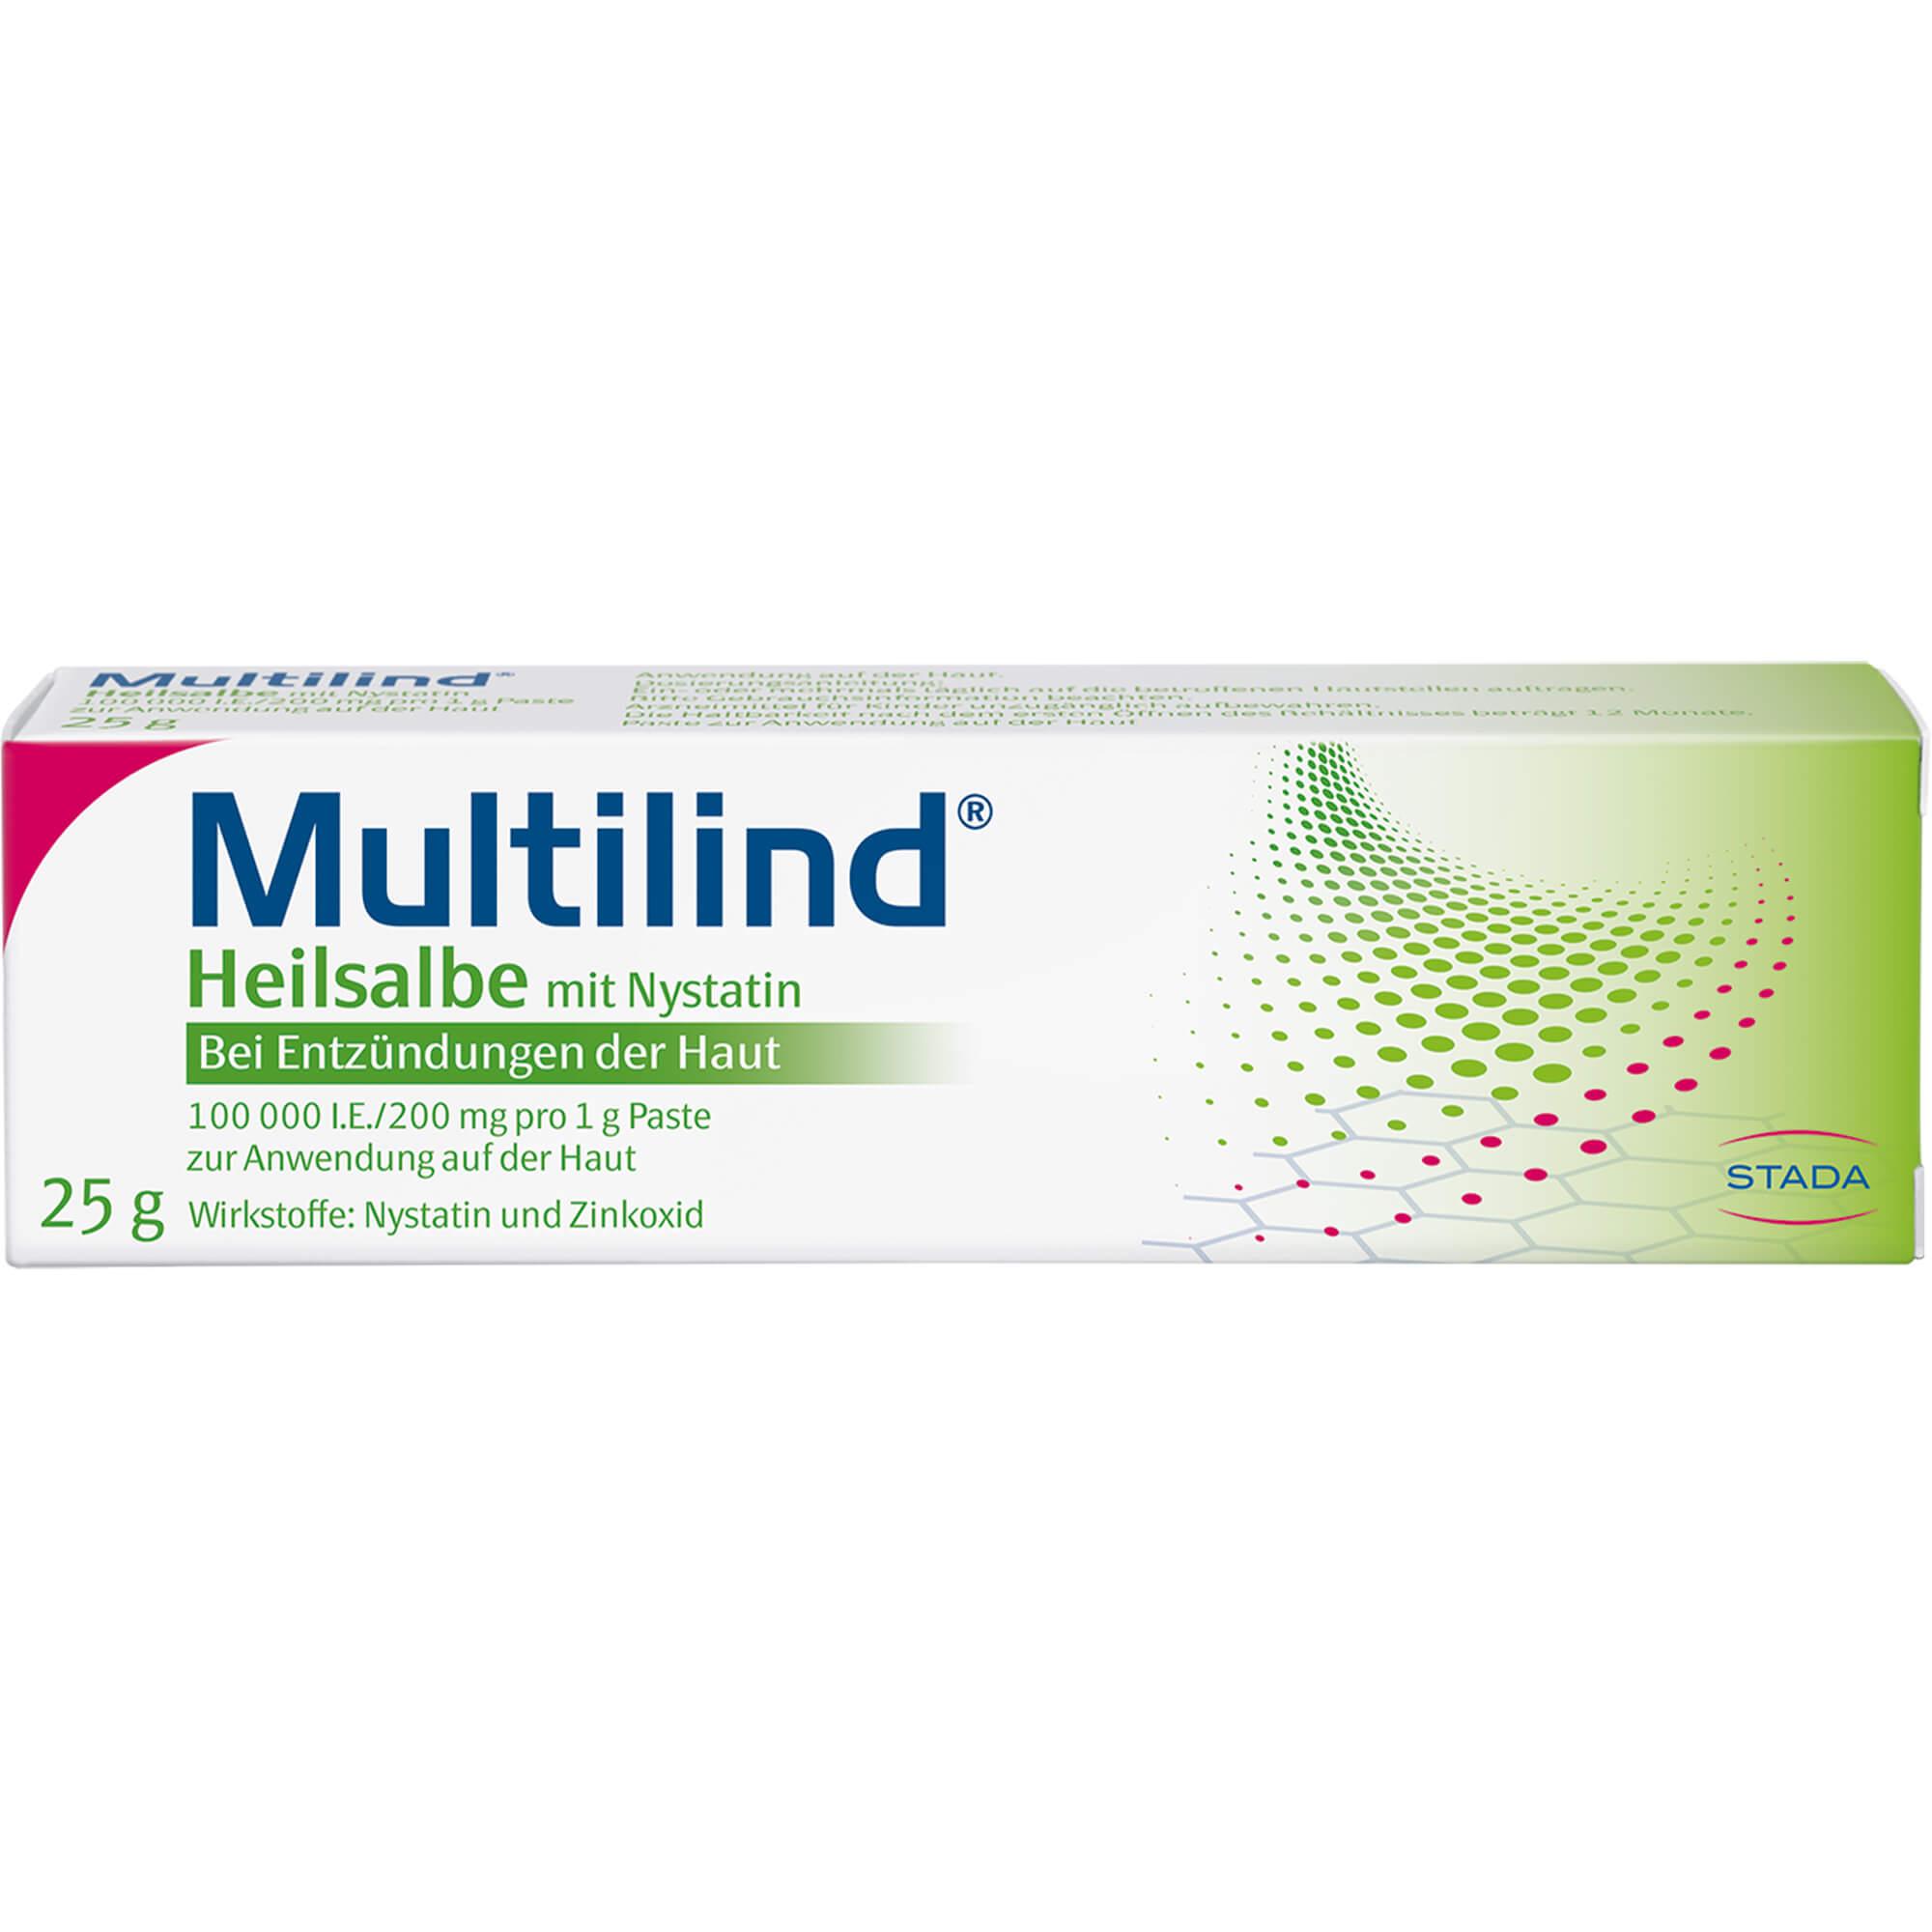 MULTILIND-Heilsalbe-m-Nystatin-u-Zinkoxid